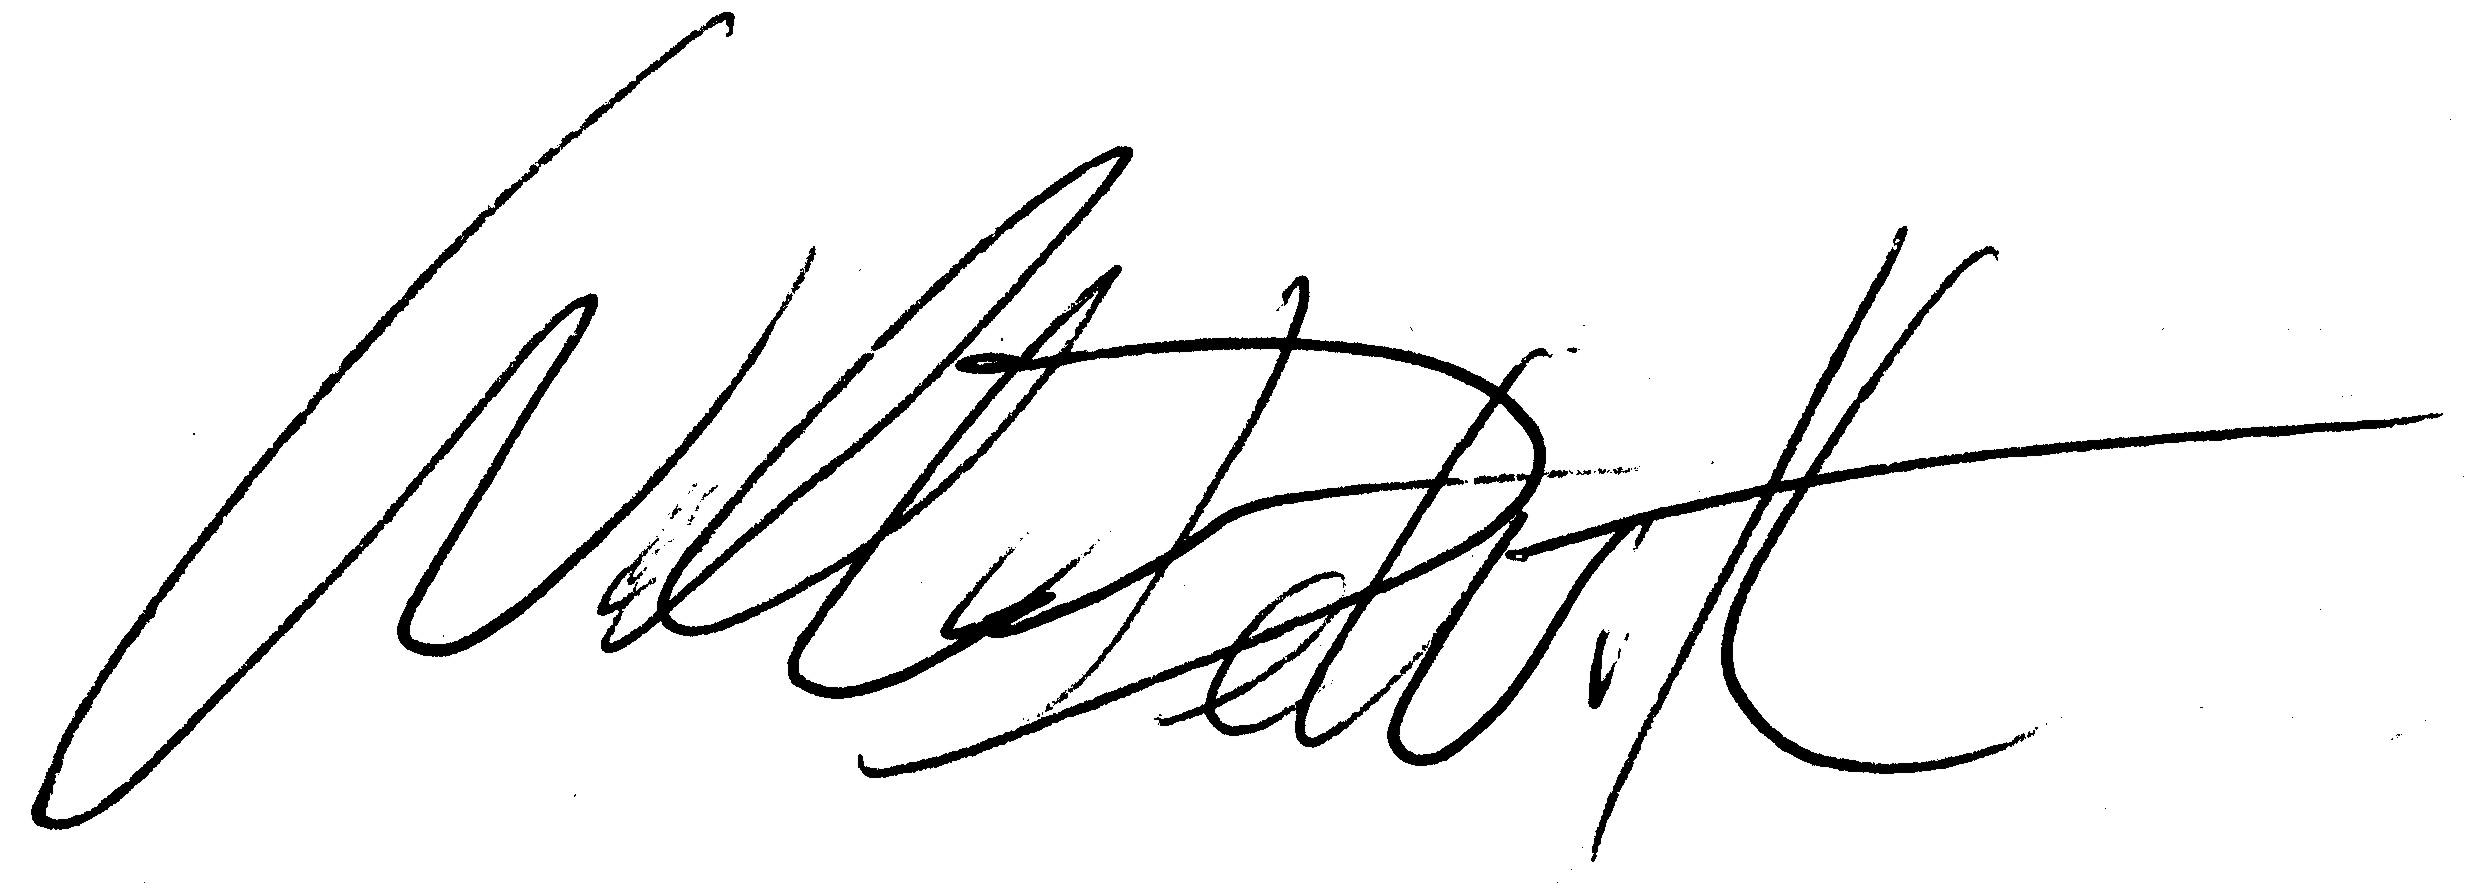 Signature Stamps | Western Laser Engraving